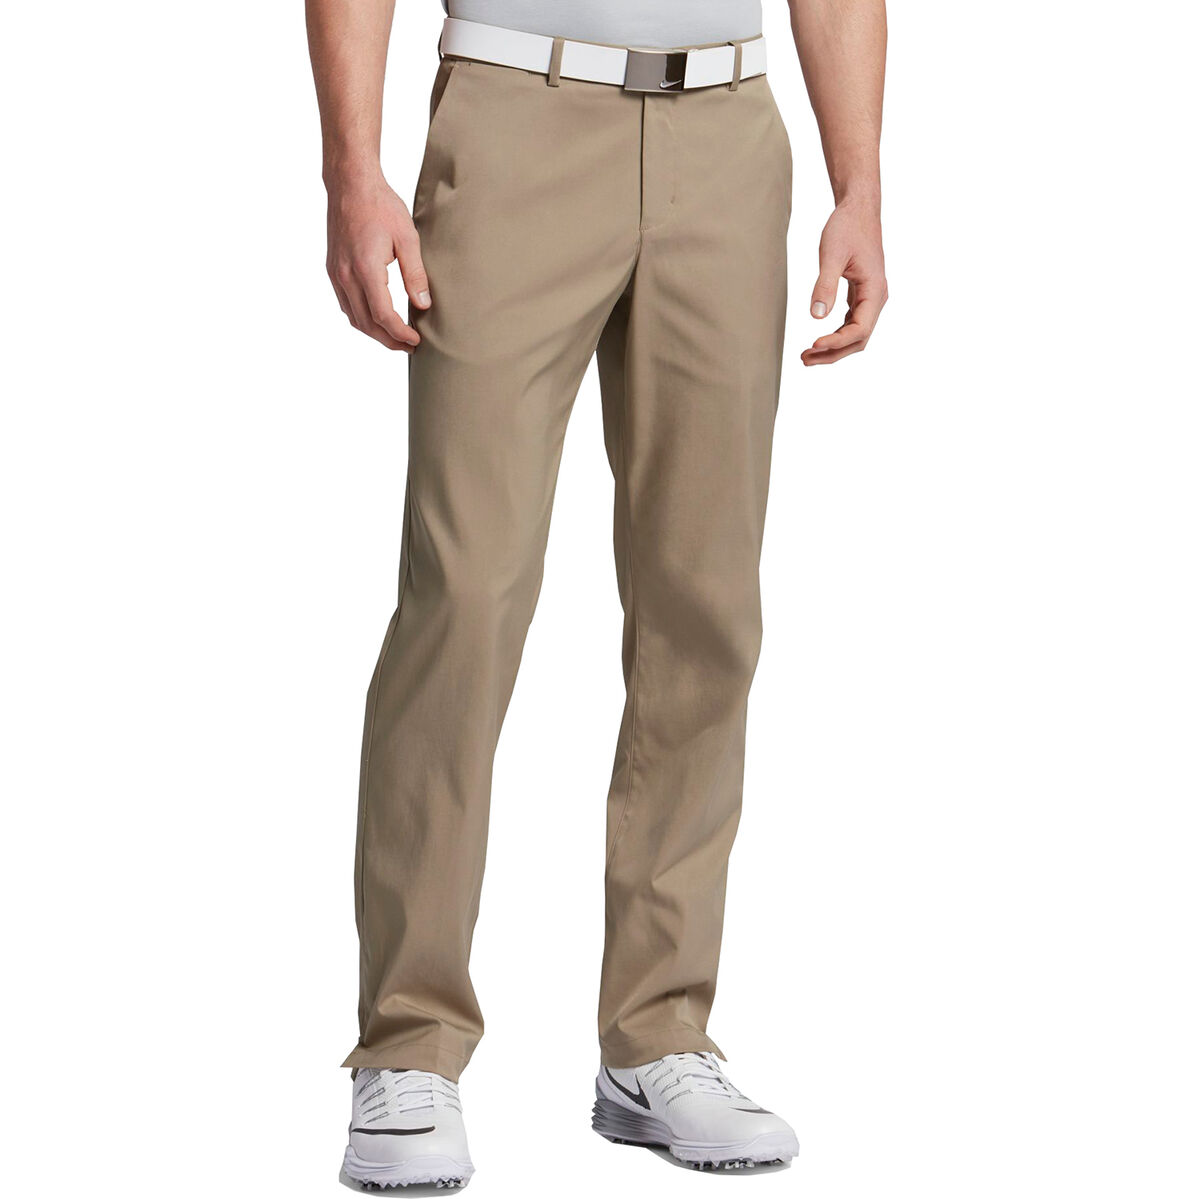 0da002d1716f Images. Nike Flat Front Pant